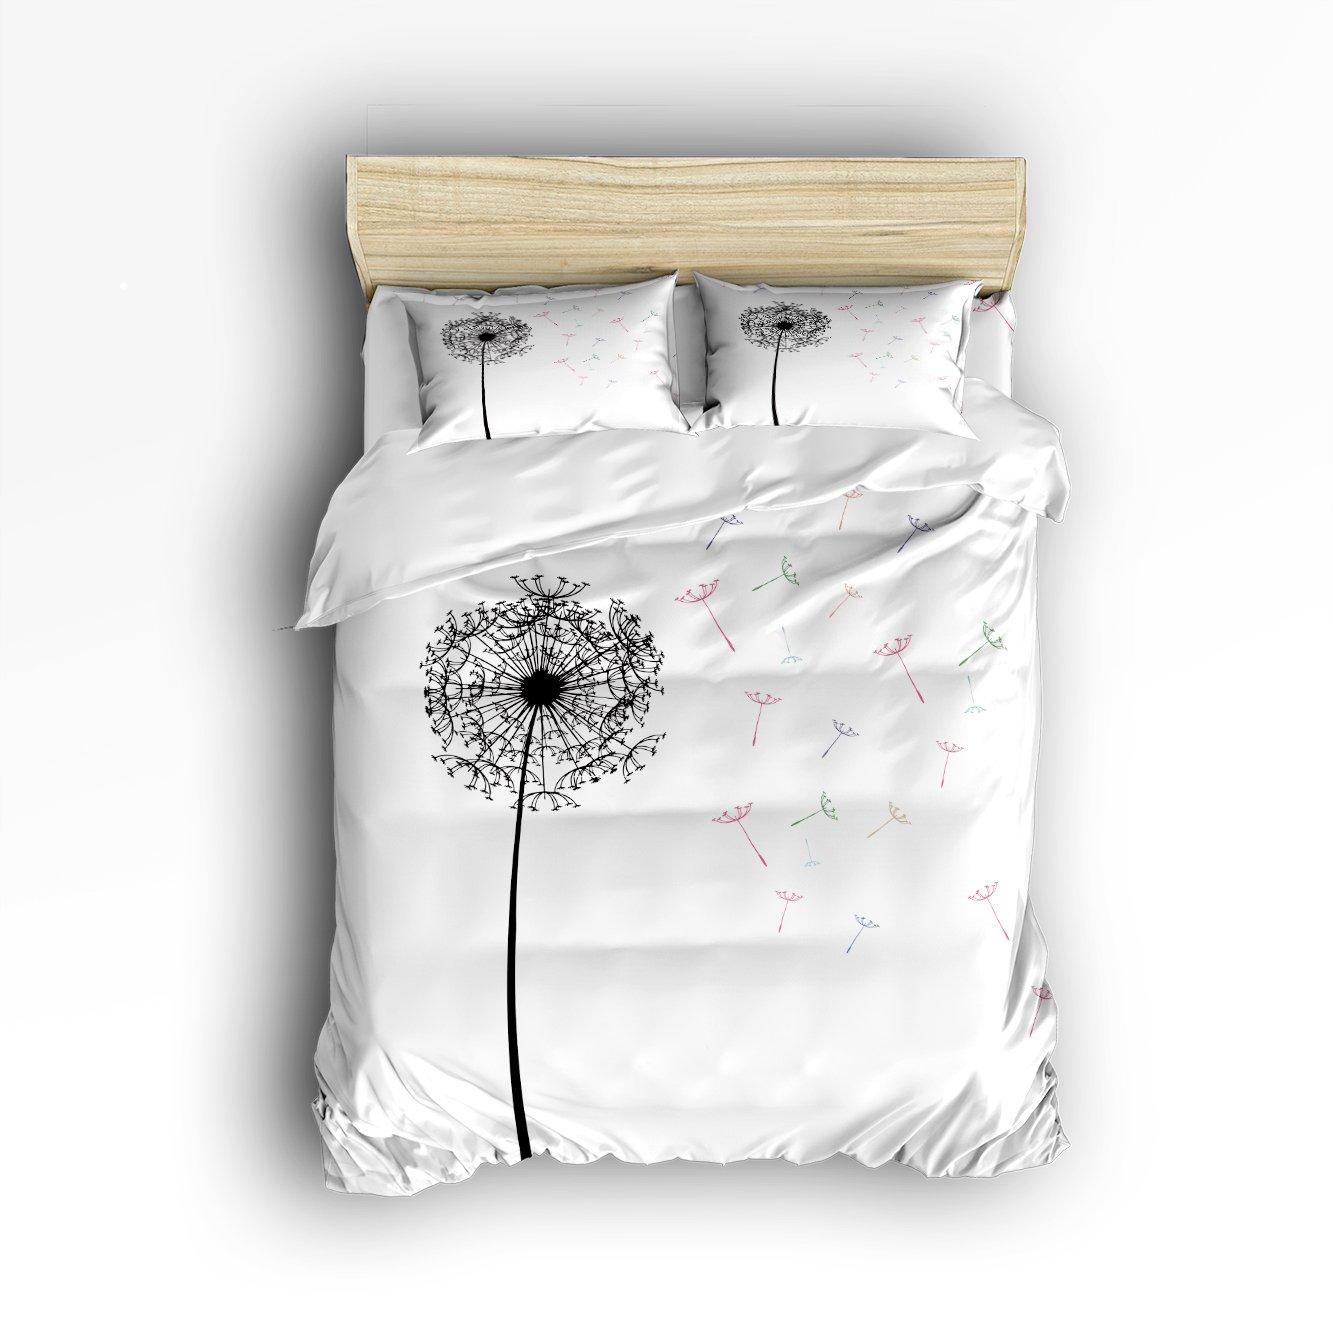 Family Decor White Black Dandelion Print Home Comforter Cover Bedding Sets Duvet Cover Sets Bedspread for Adult Kids,Flat Sheet, Shams Set 4Pieces,4 Pcs Queen Size for Kids Teenage Teens